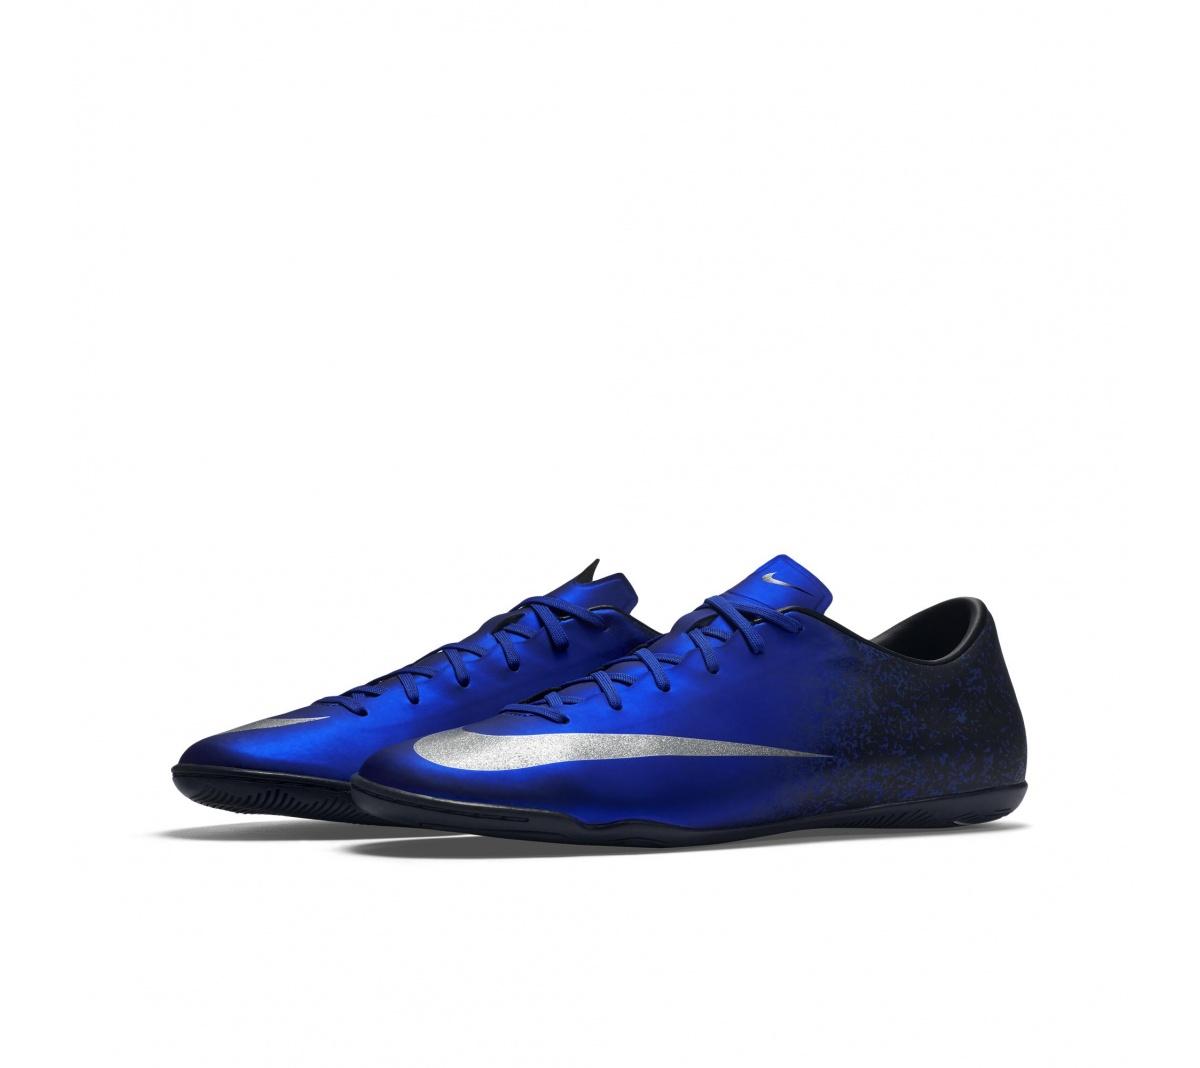 sneakers for cheap 9fb46 d4051 ... coupon for chuteira futsal nike mercurial vortex ii cr7 tênis nike  mercurial victory v cr ic